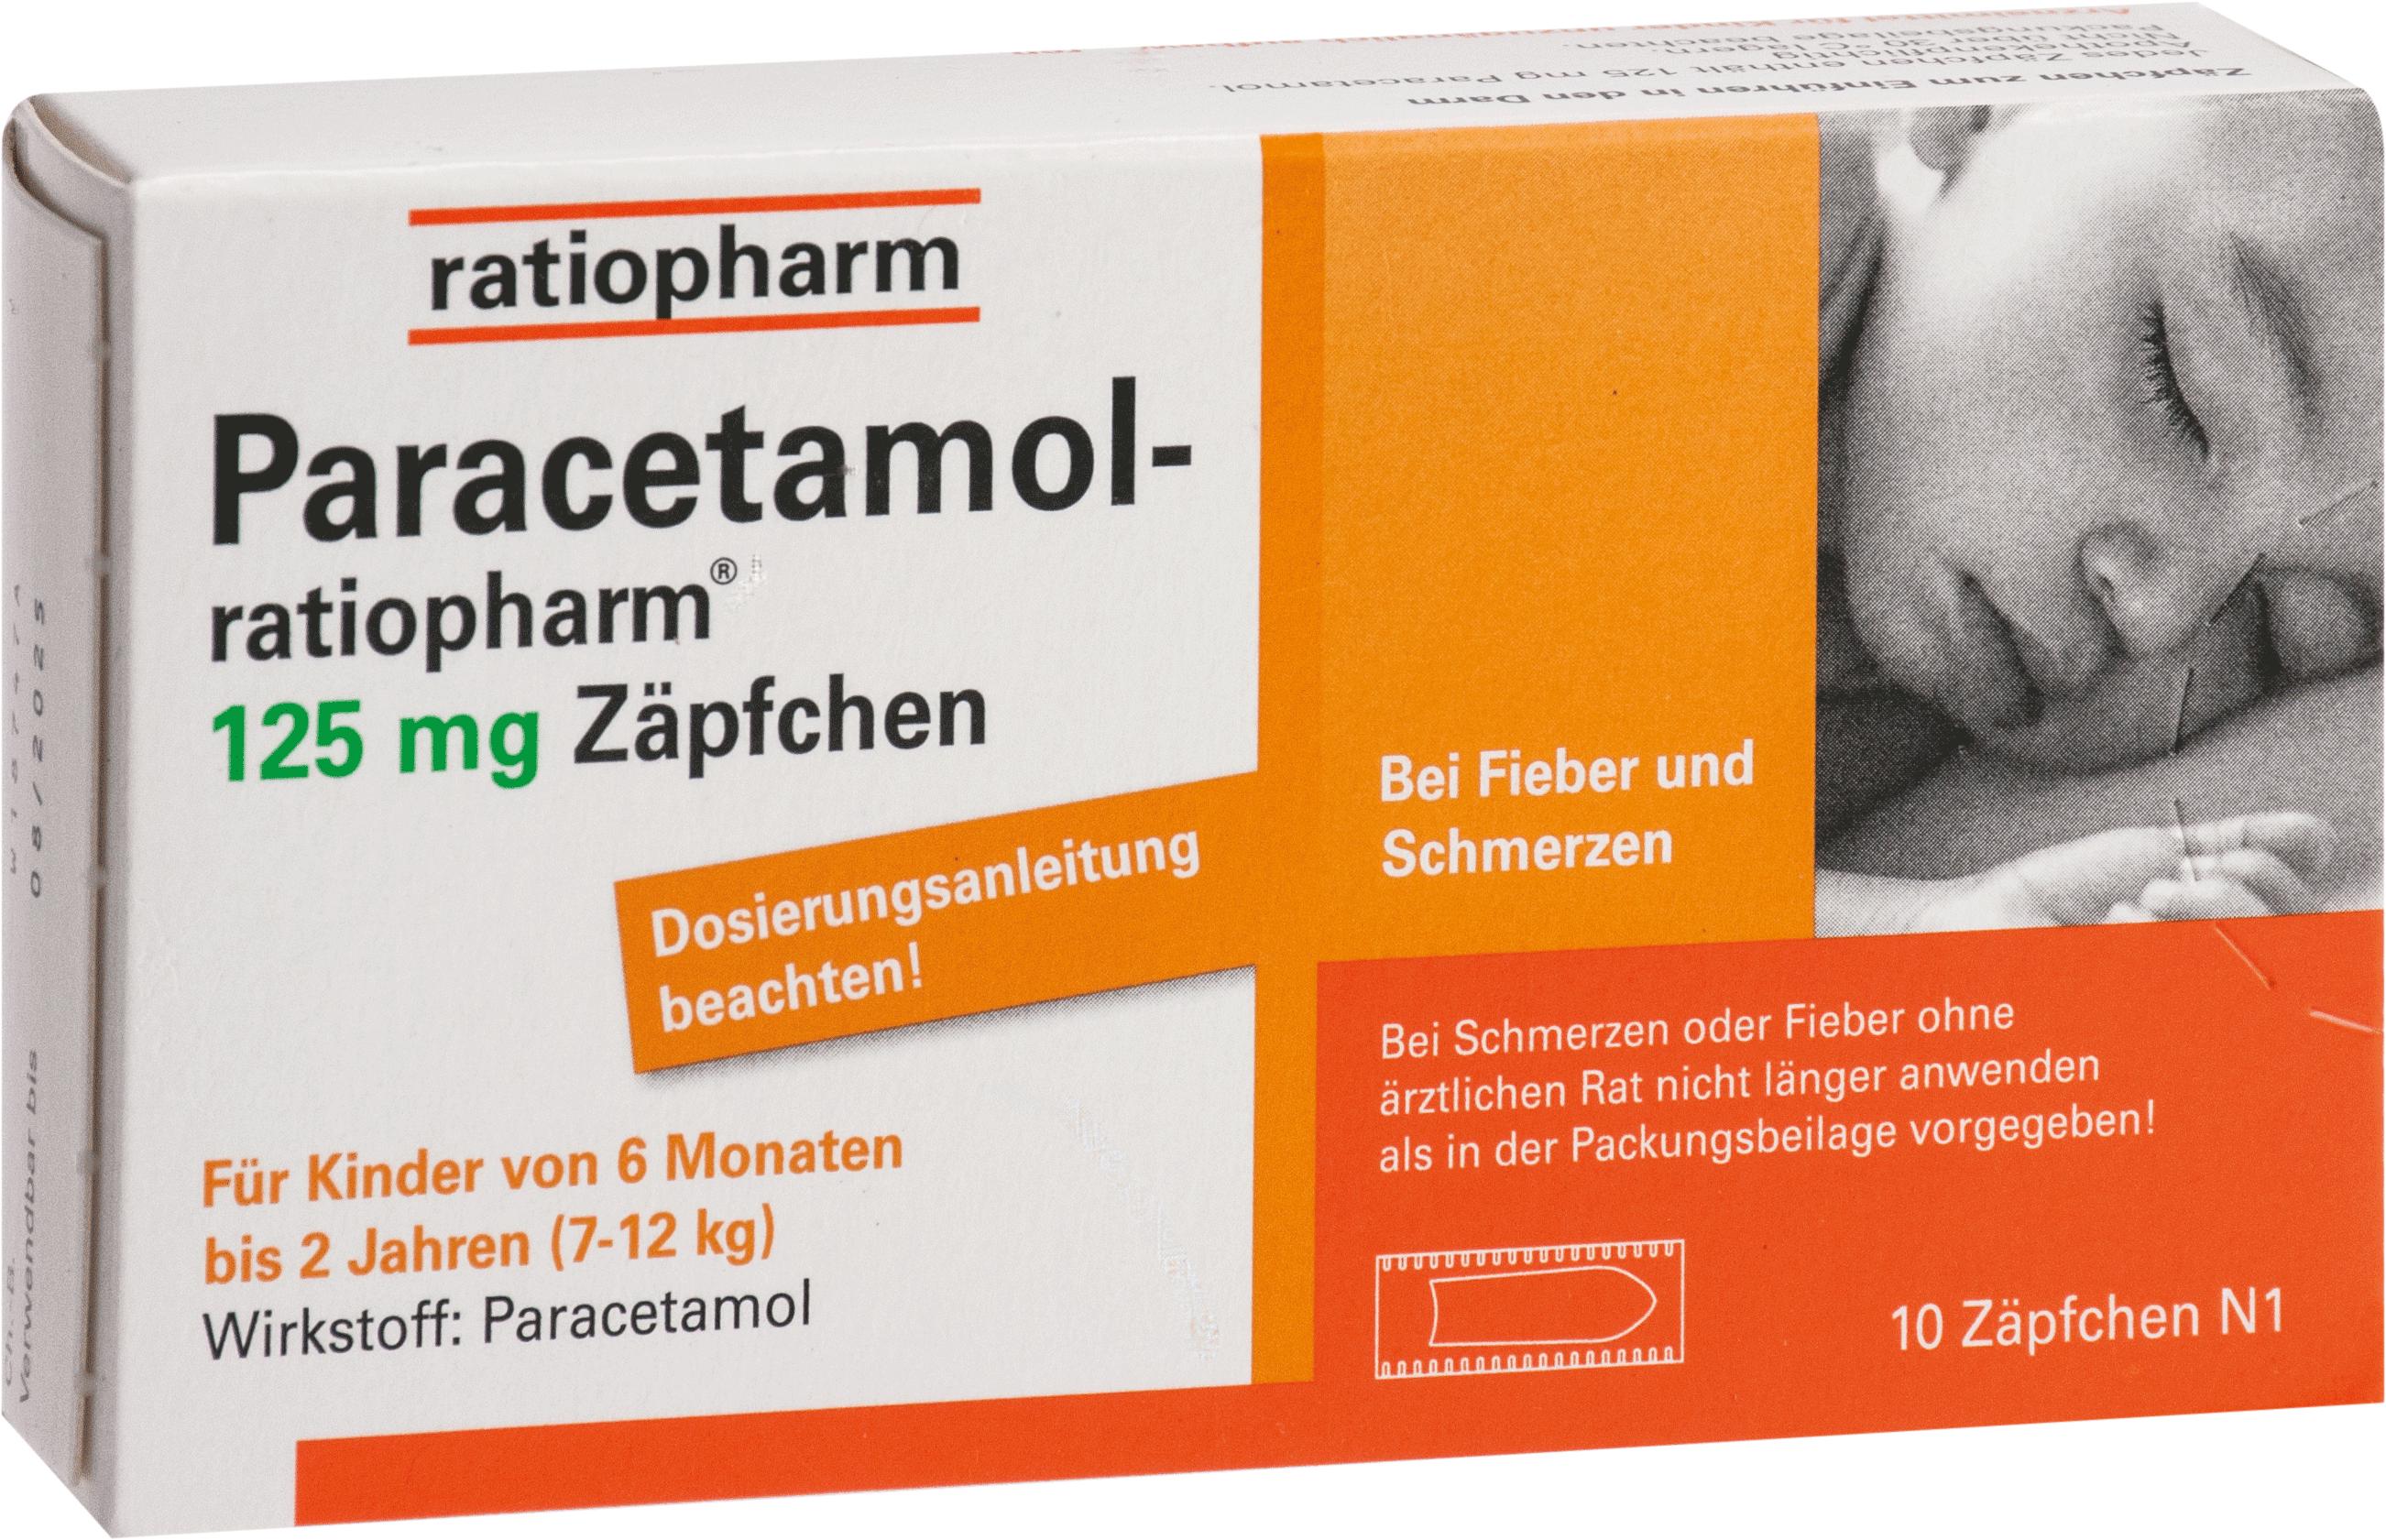 Paracetamol-ratiopharm 125mg Zäpfchen